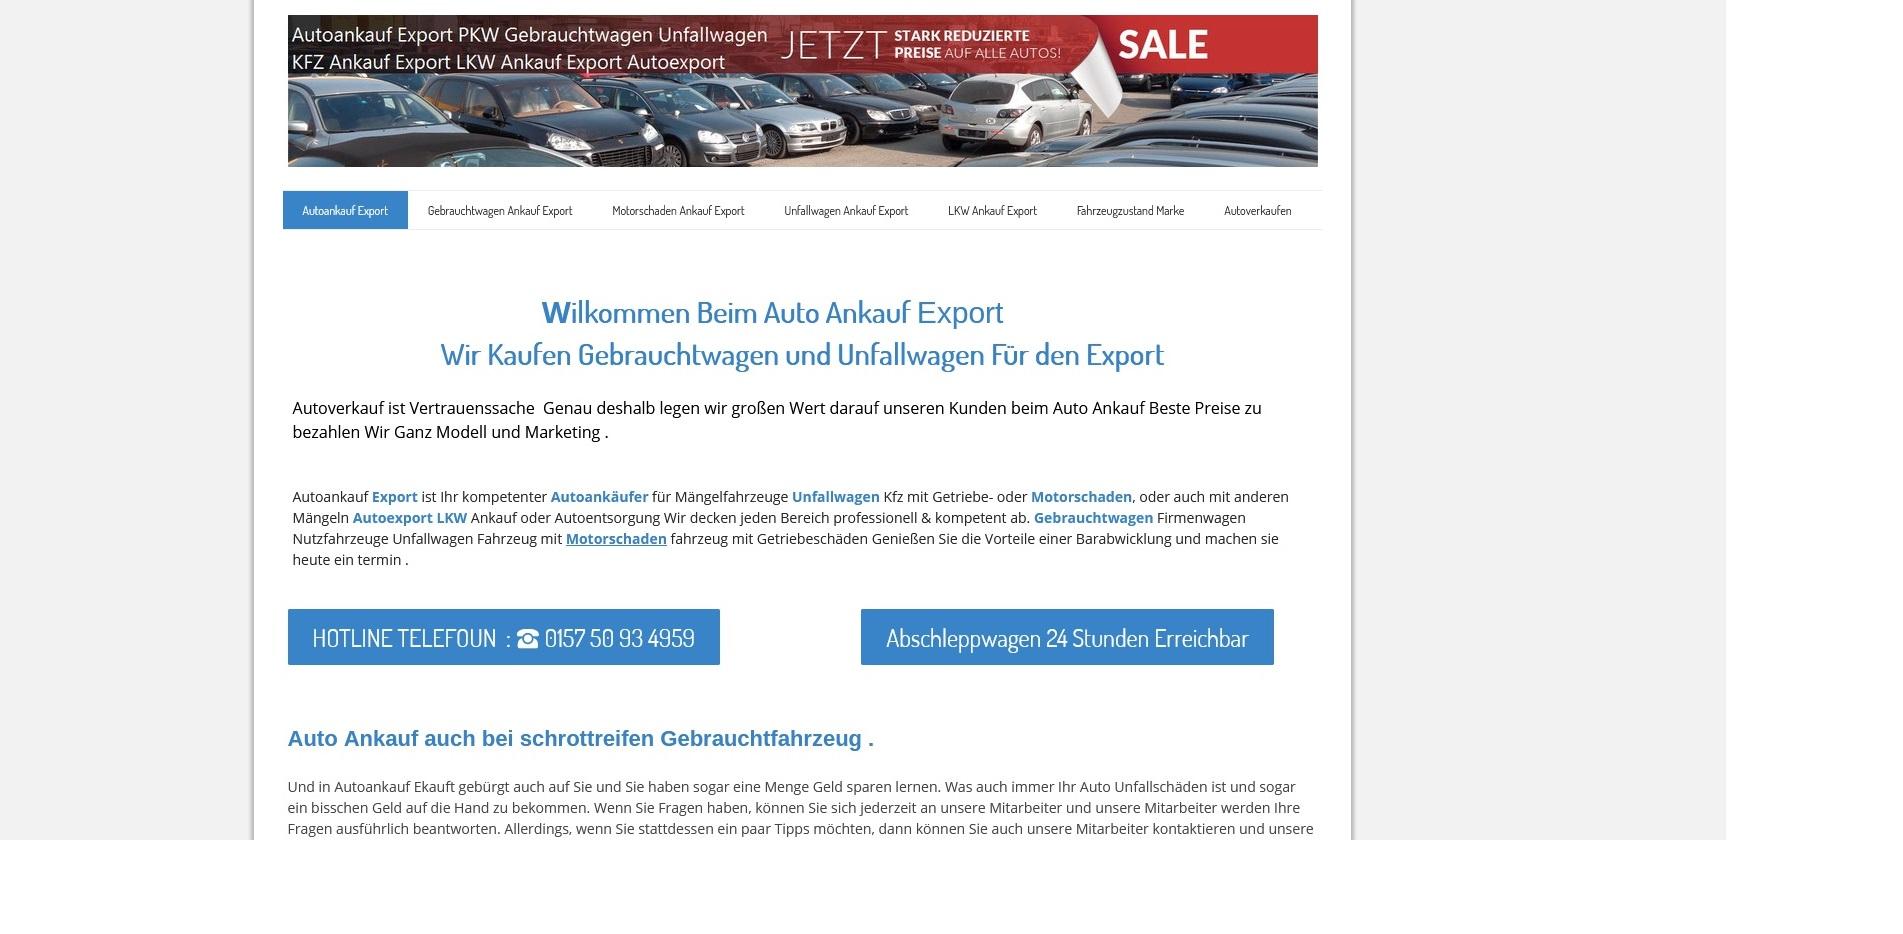 https://www.kfz-ankauf-export.de - Autoankauf Elmshorn